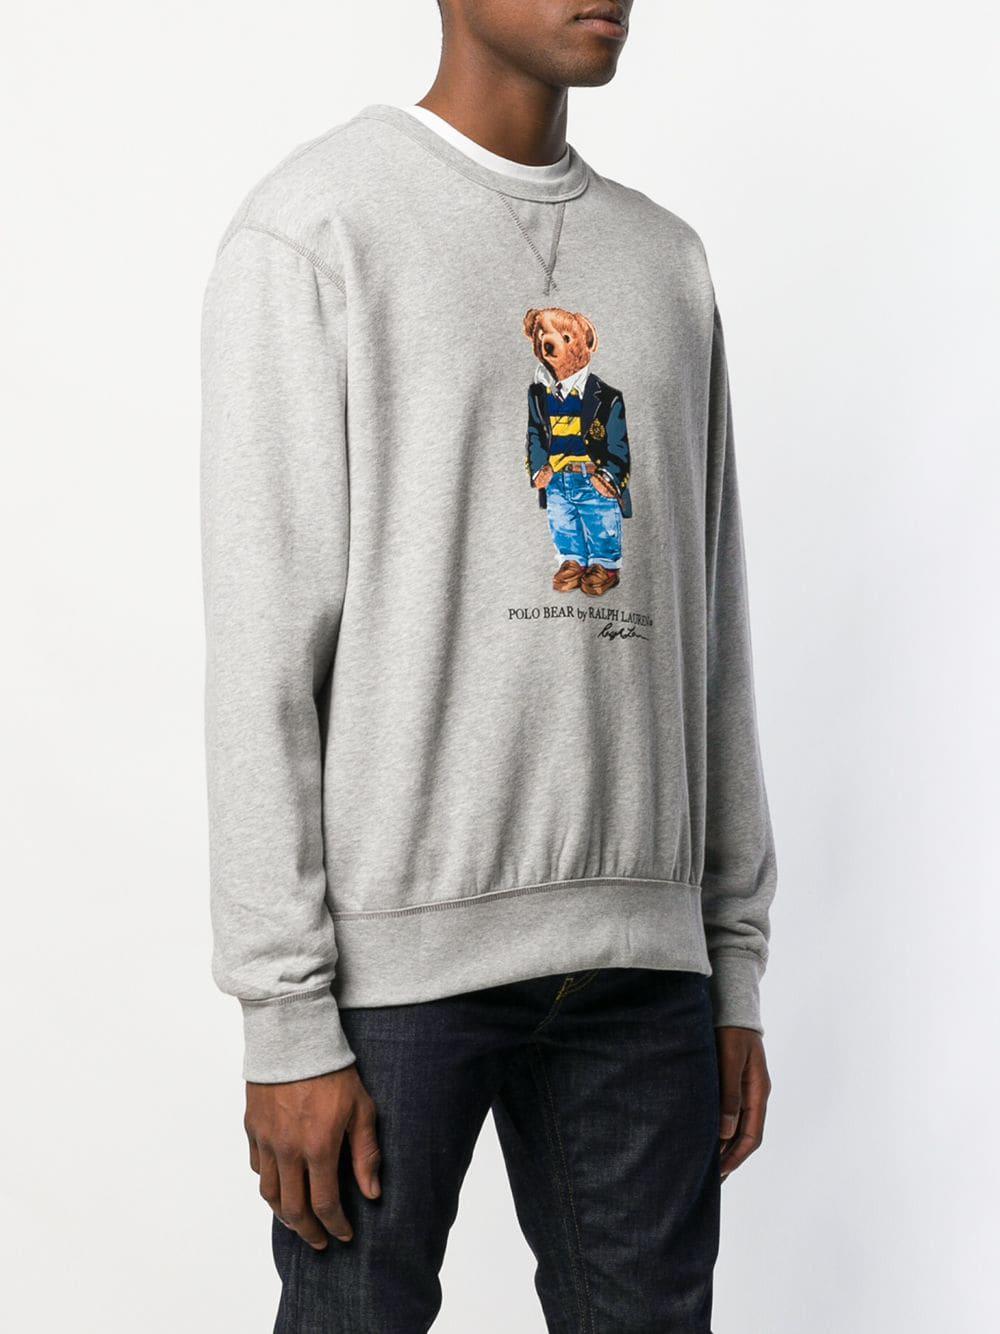 698160a90 Polo Ralph Lauren - Gray Polo Bear Sweatshirt for Men - Lyst. View  fullscreen